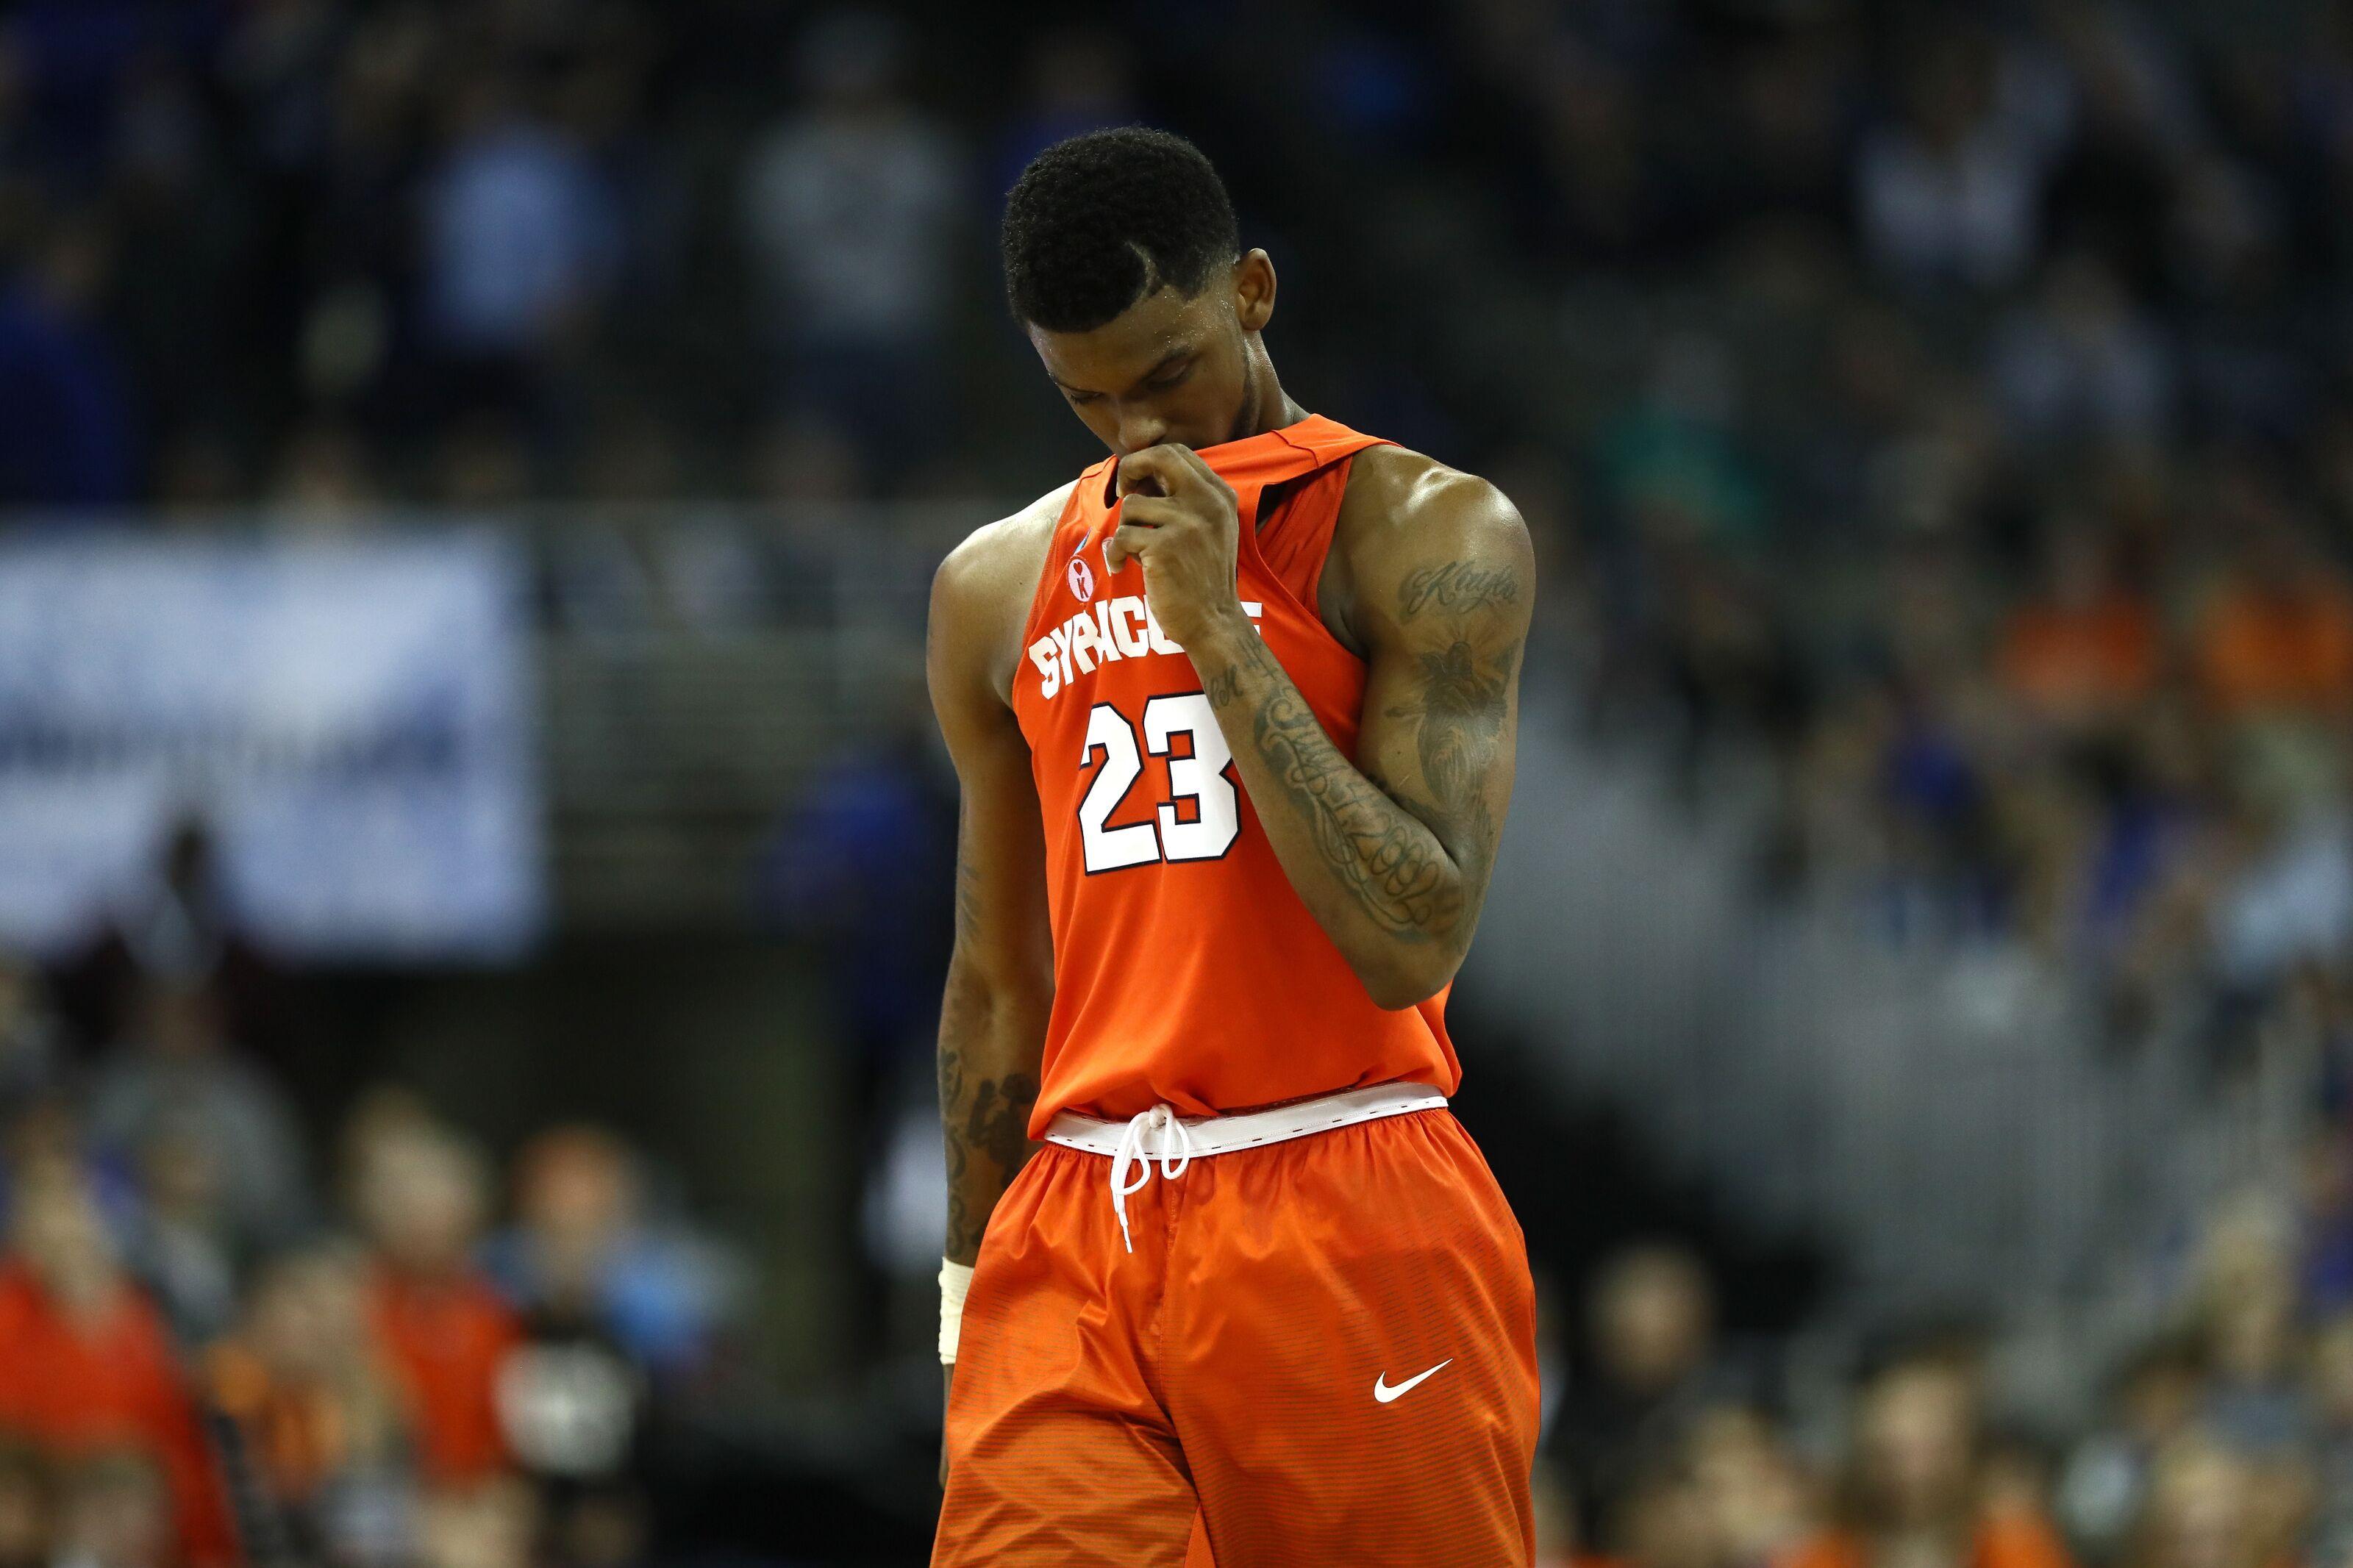 Syracuse Basketball Frank Howard Critical For Orange Down The Stretch